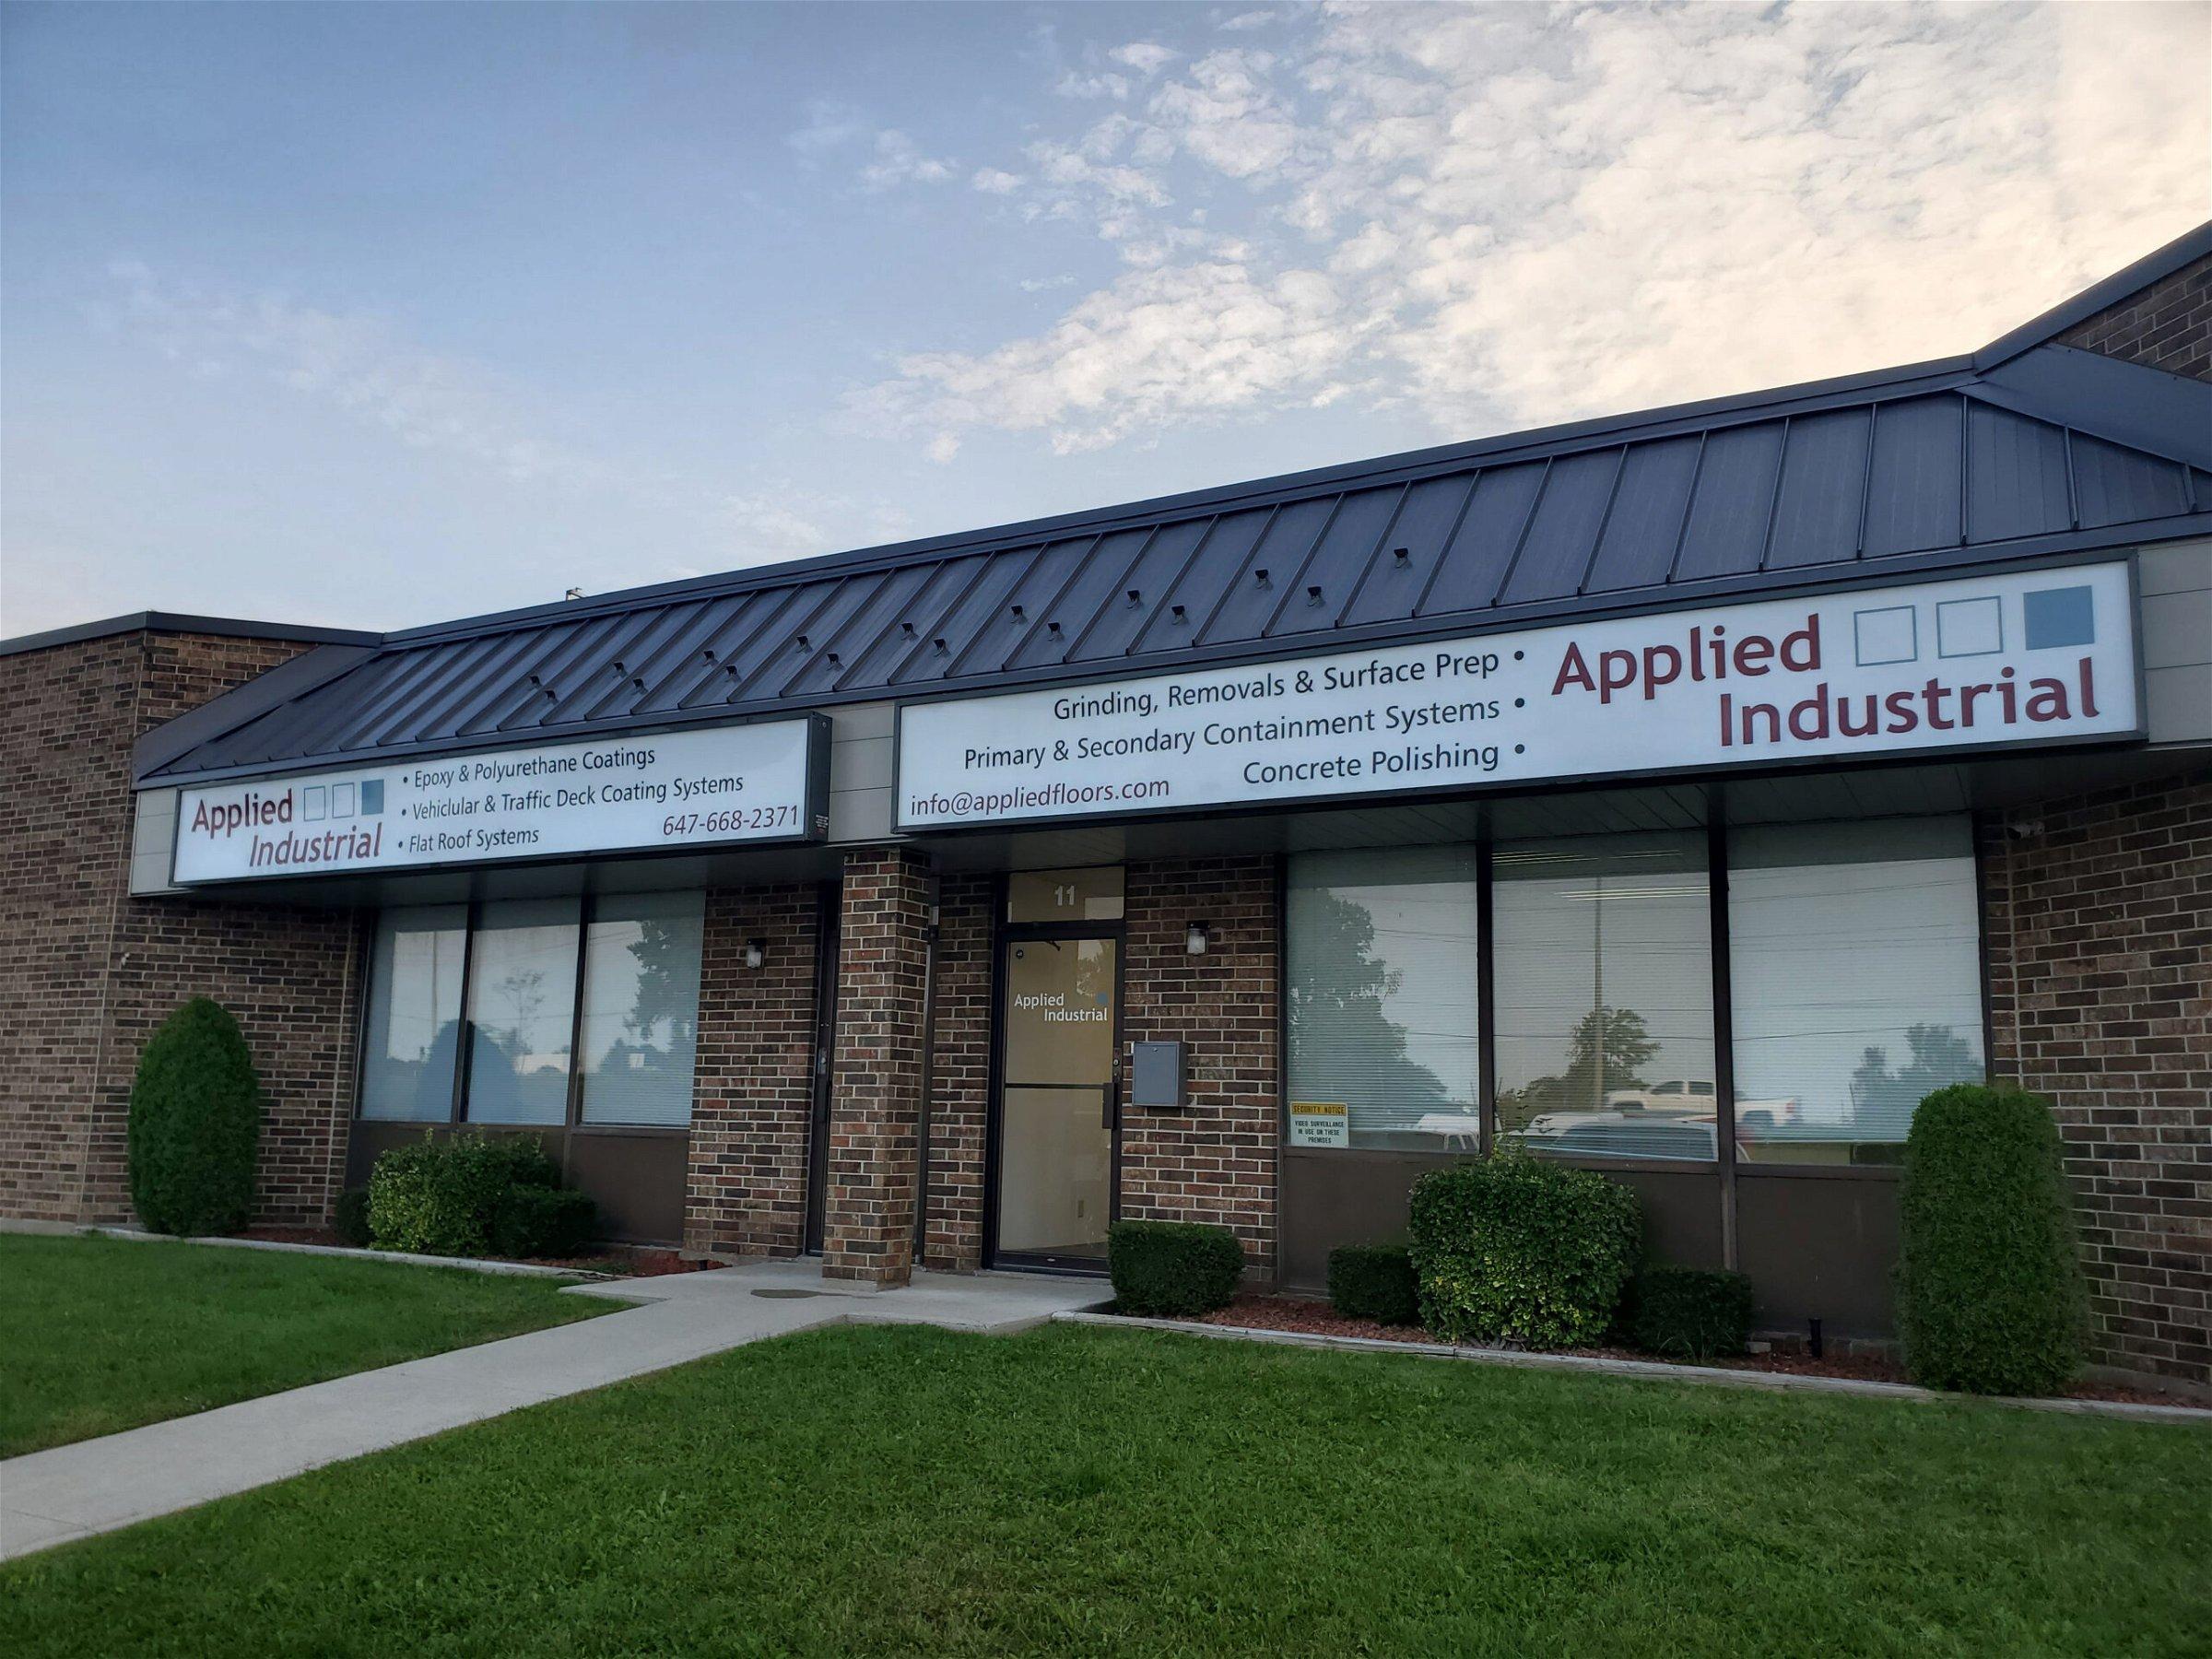 Applied Flooring Cambridge office front